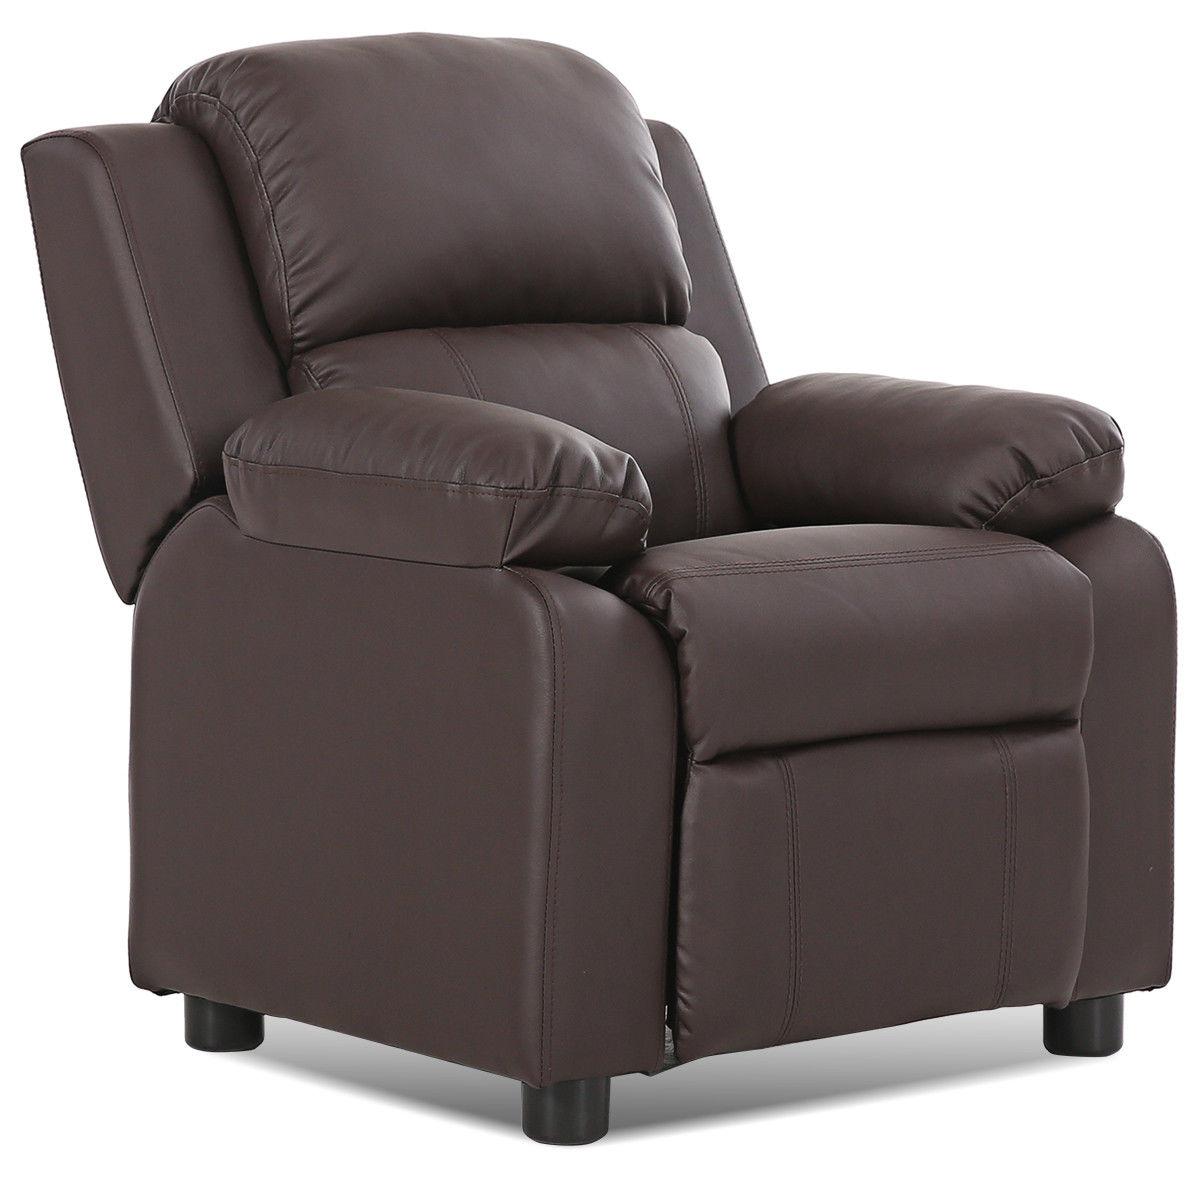 Brown Deluxe Padded Kids Sofa Armchair Recliner Headrest Children W Arms